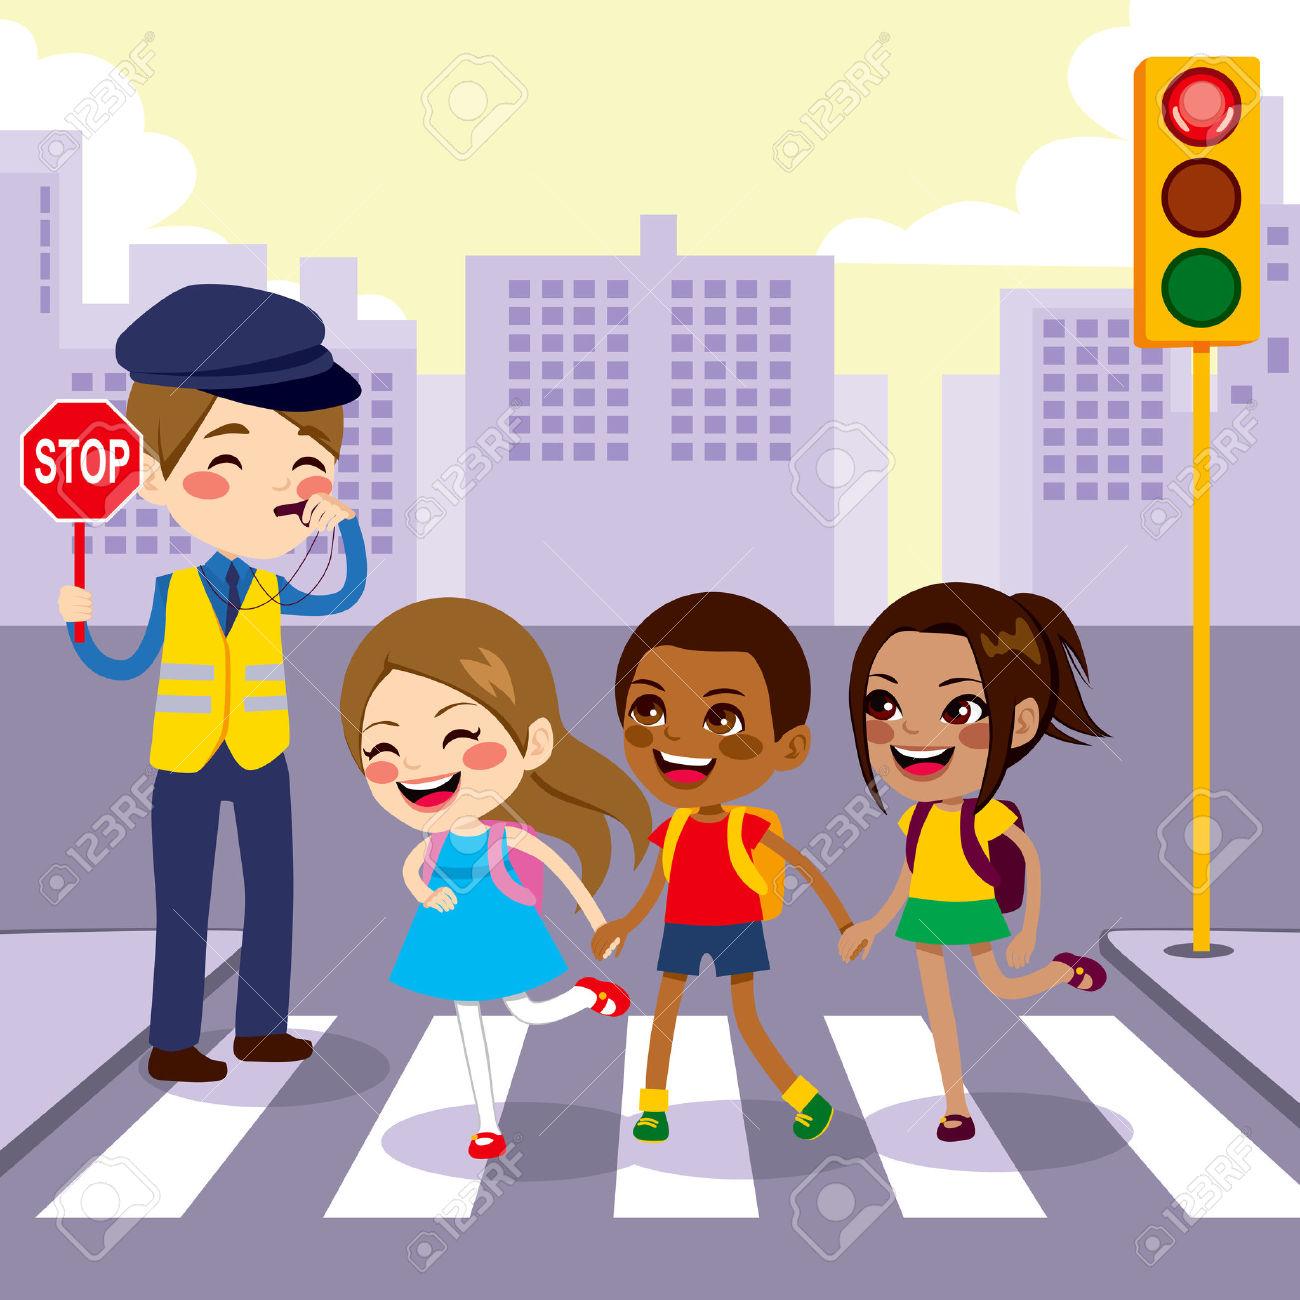 2,456 Crosswalk Stock Vector Illustration And Royalty Free.